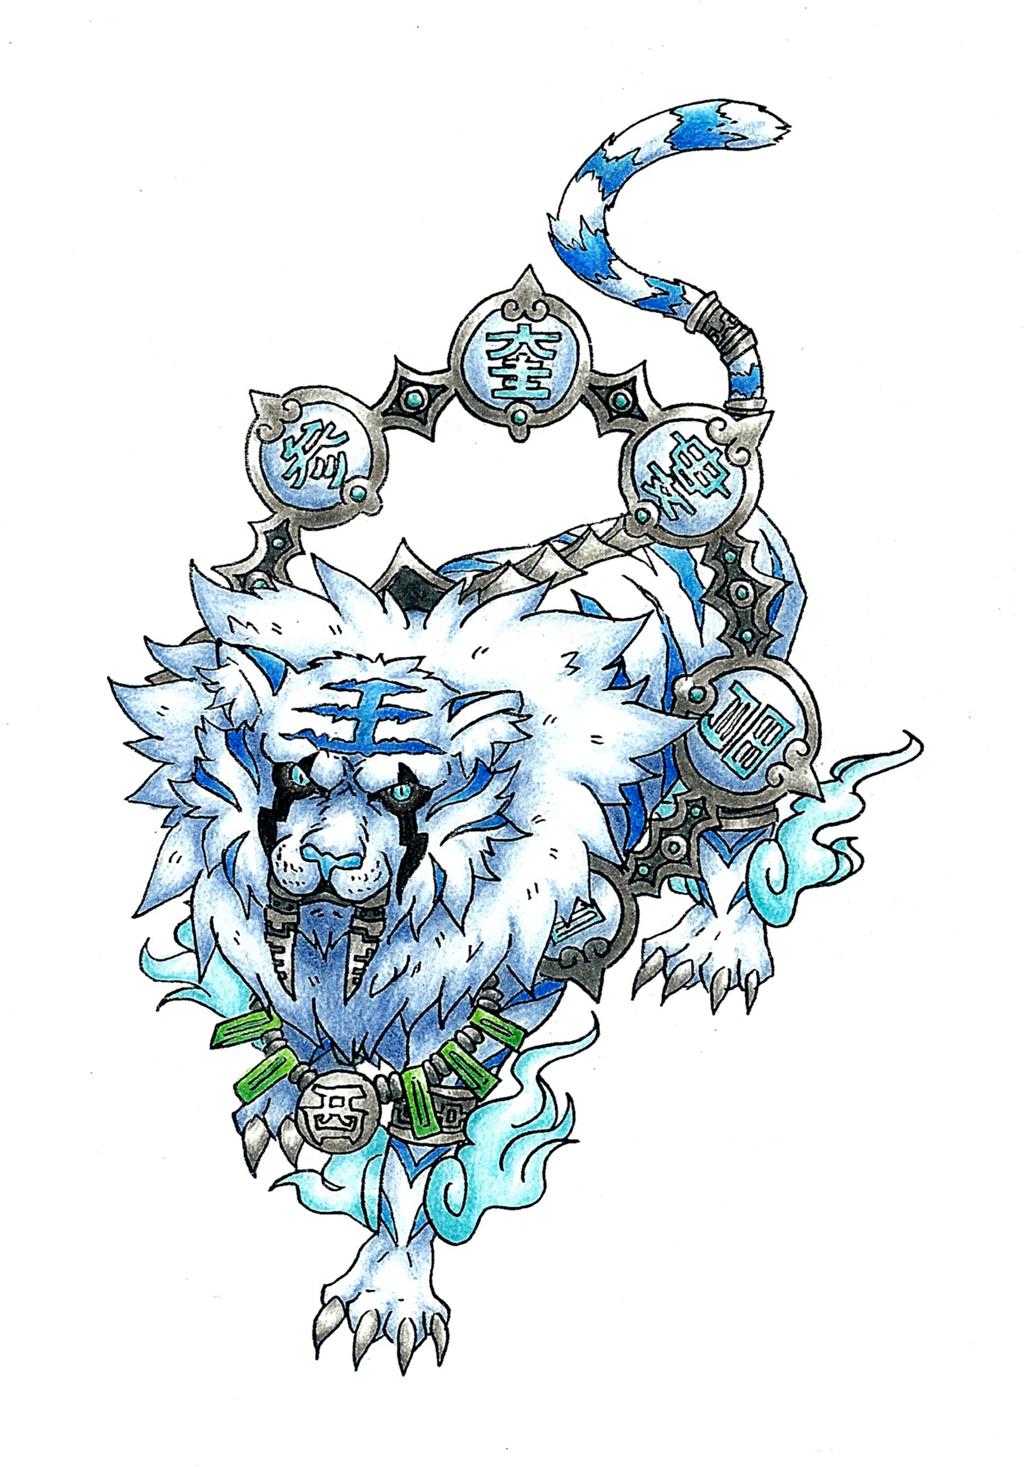 Byakko White Tiger Of The West By AtmaFlare On DeviantArt